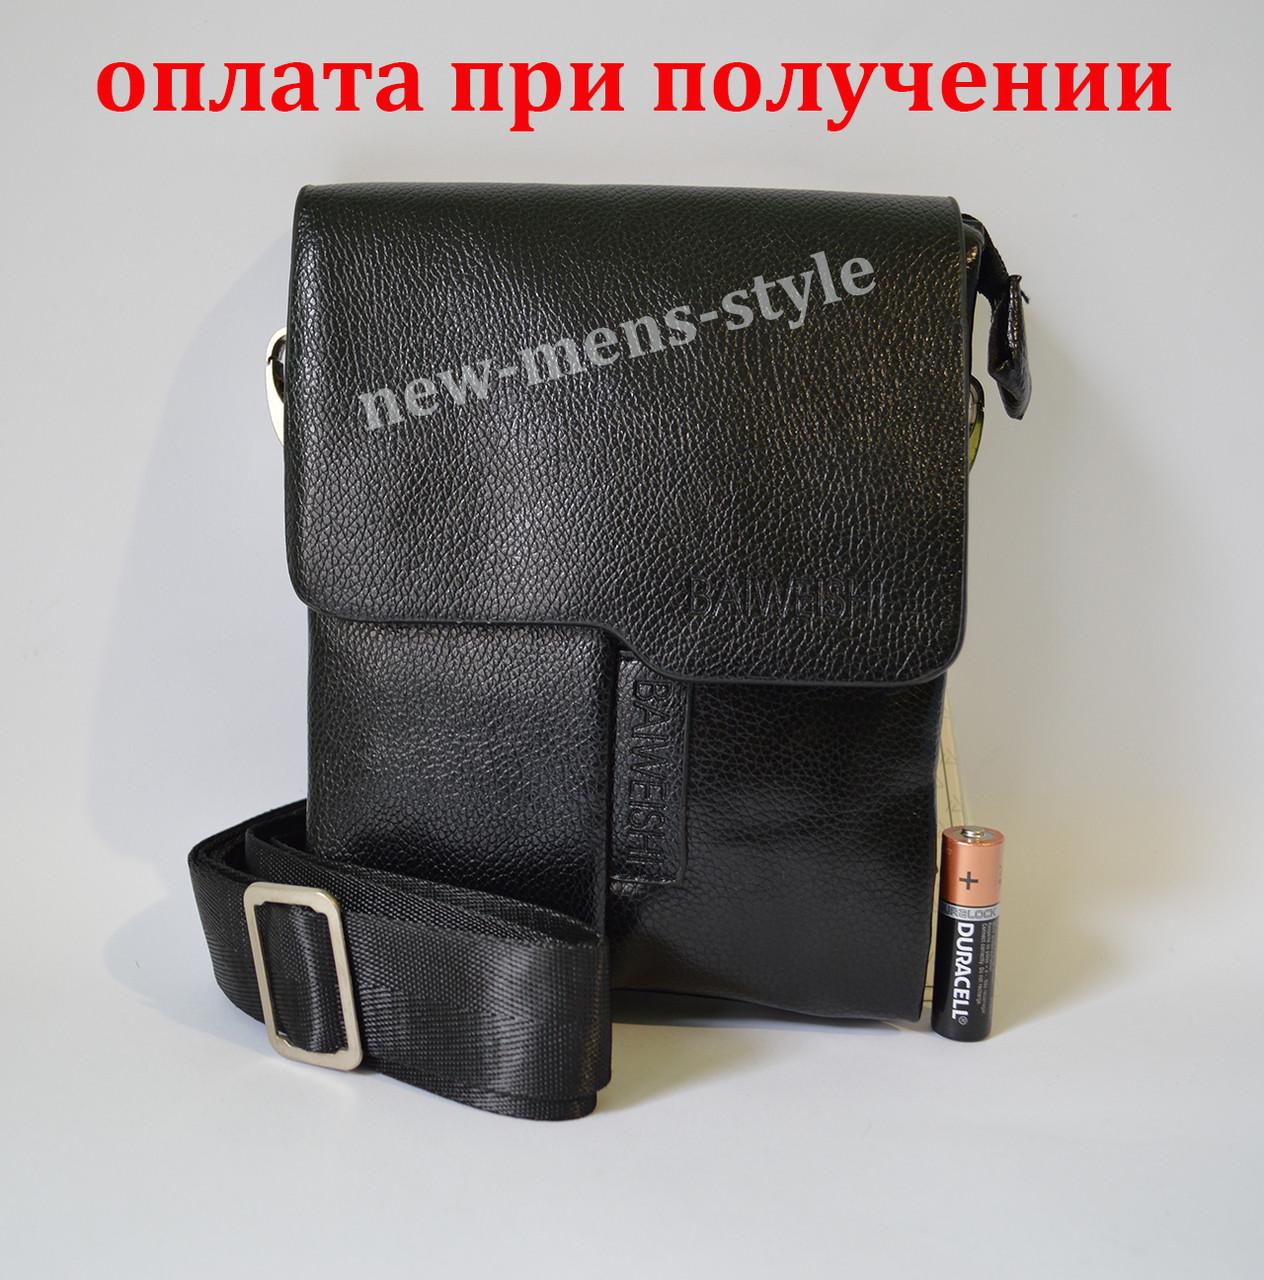 cabb624ae178 Мужская кожаная фирменная сумка барсетка BAIWEISHI Polo купить шкіряна